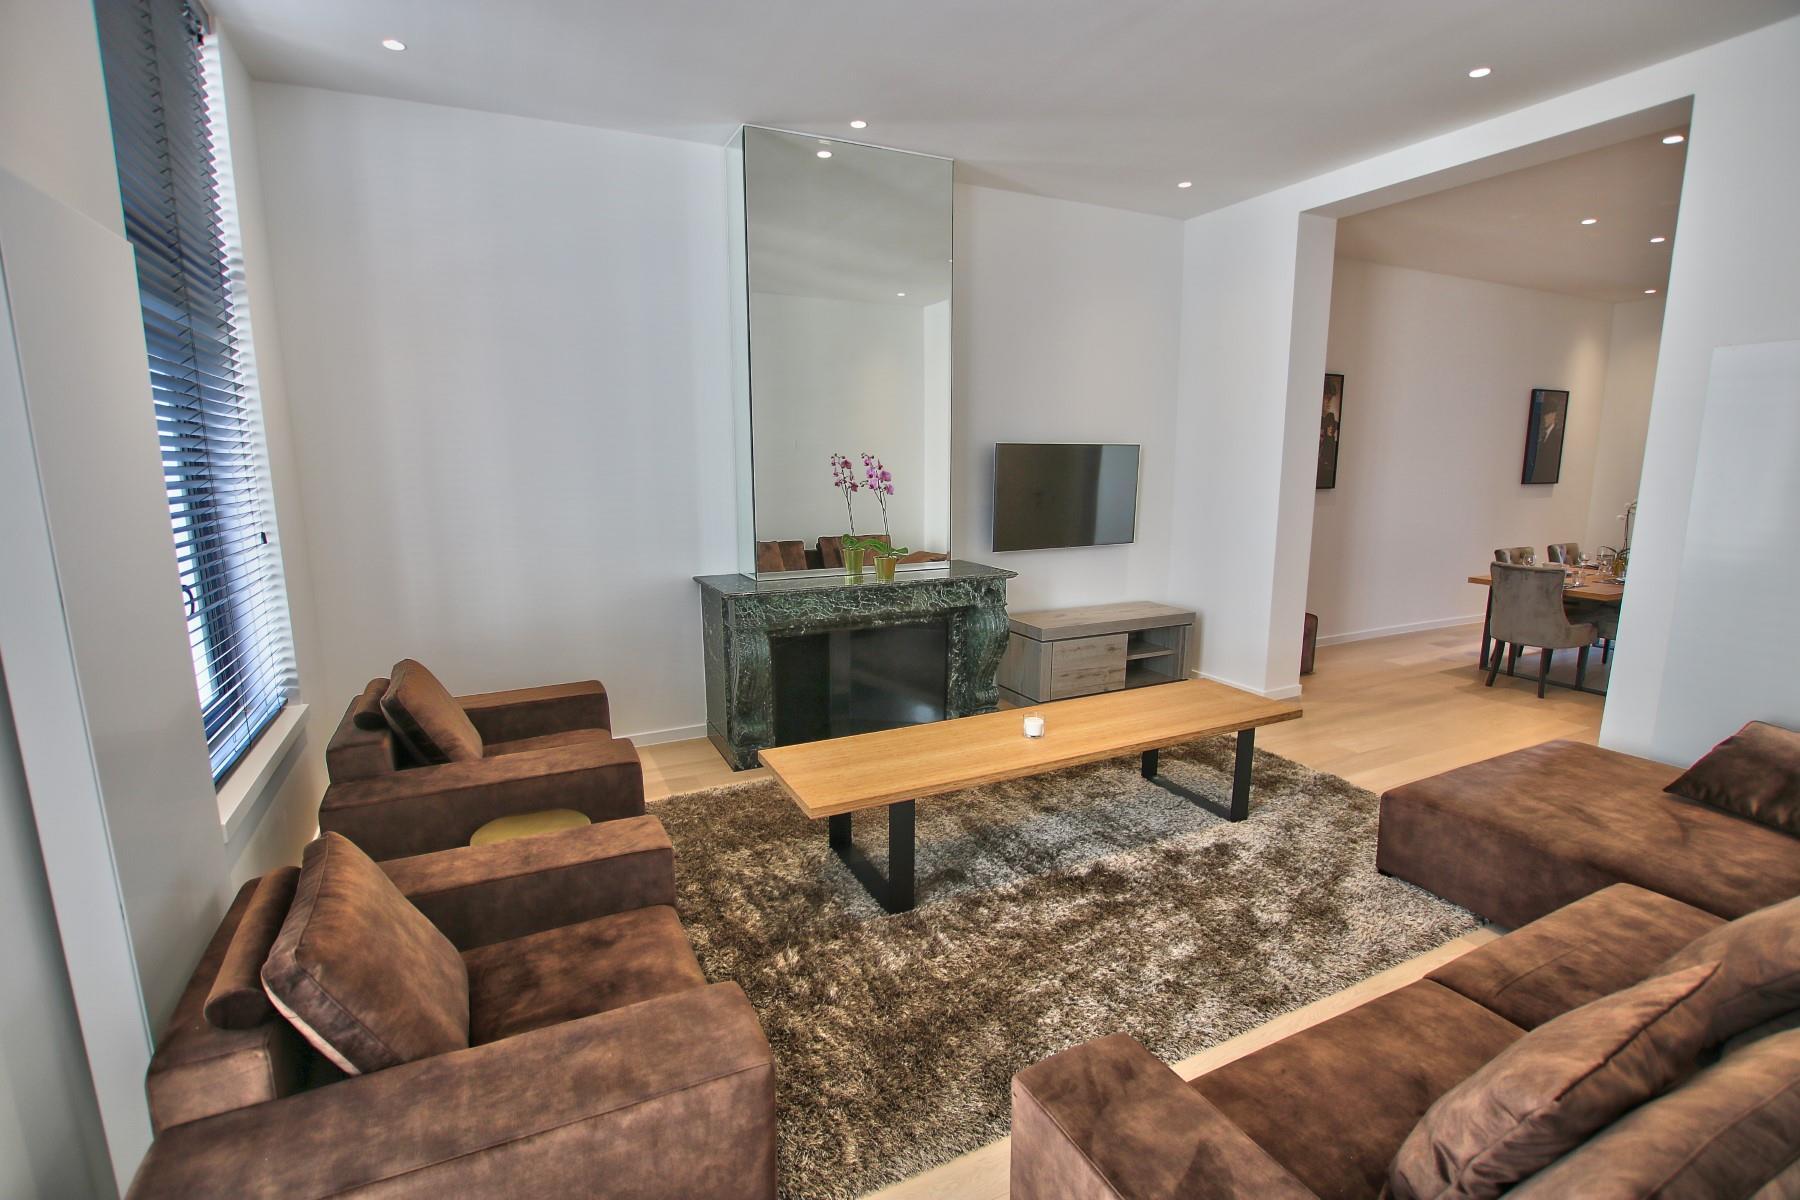 Appartement exceptionnel - Etterbeek - #4255737-1